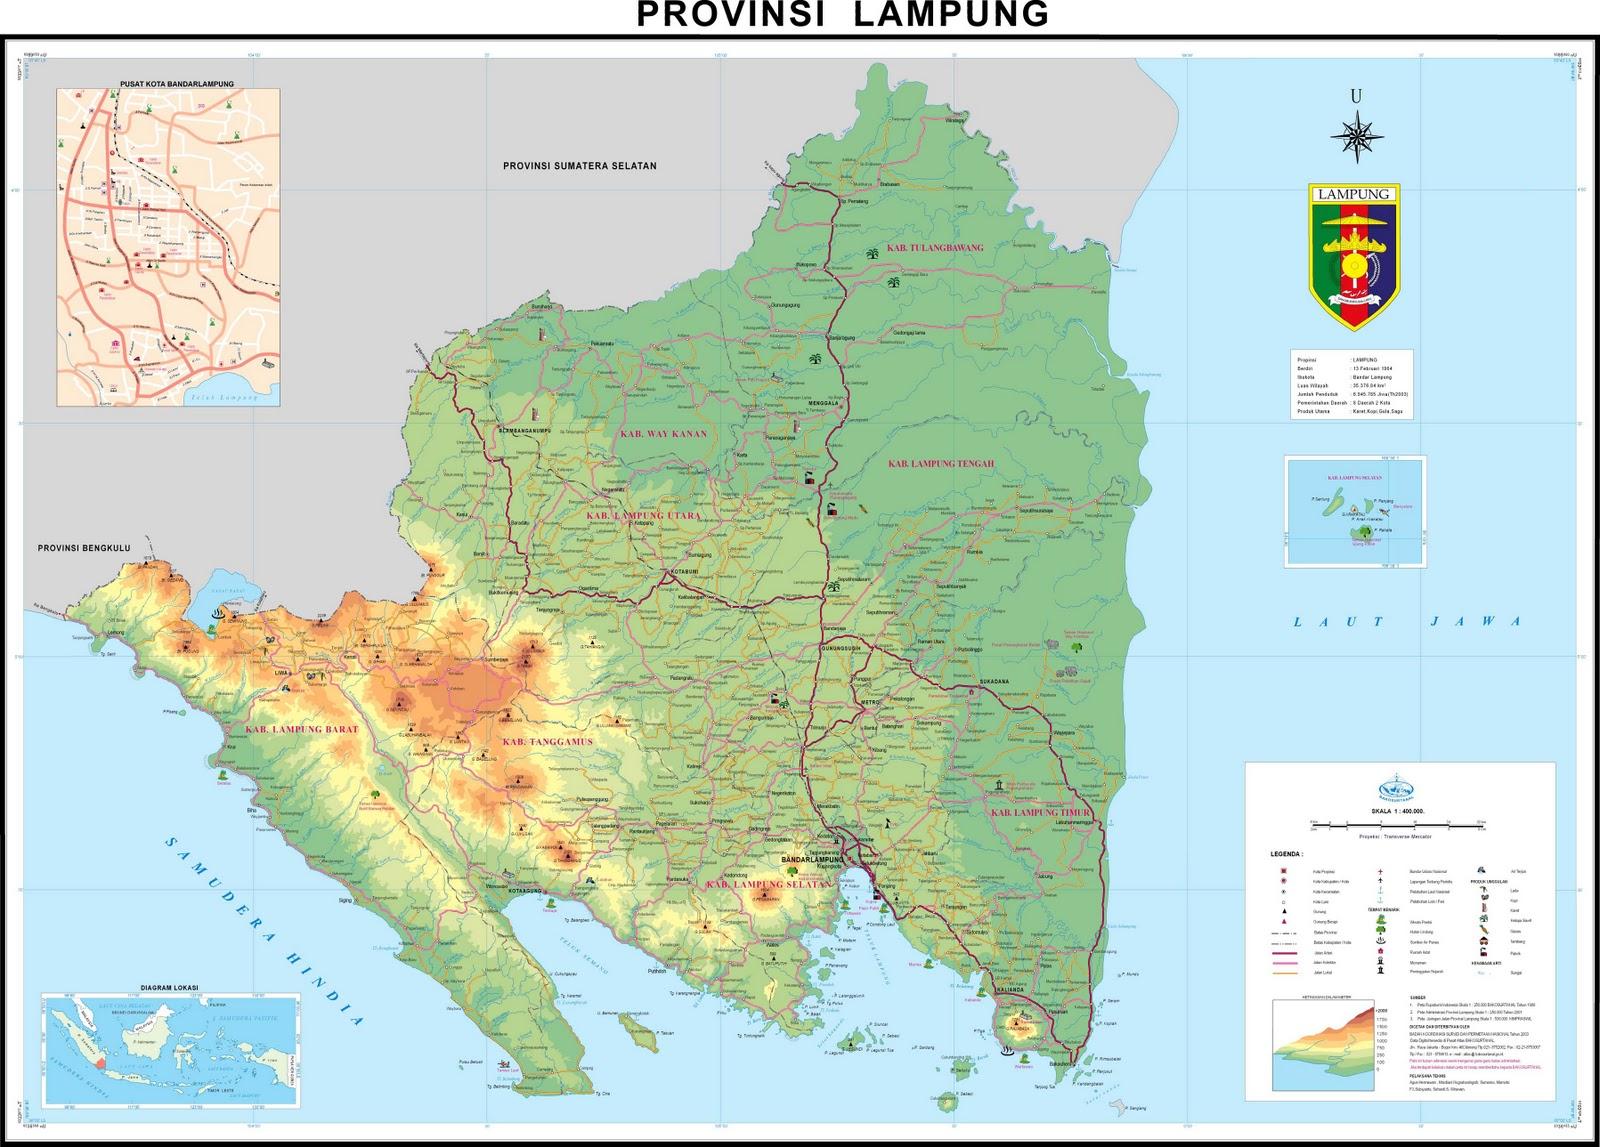 TAKJUB INDONESIA: PETA PROPINSI LAMPUNG